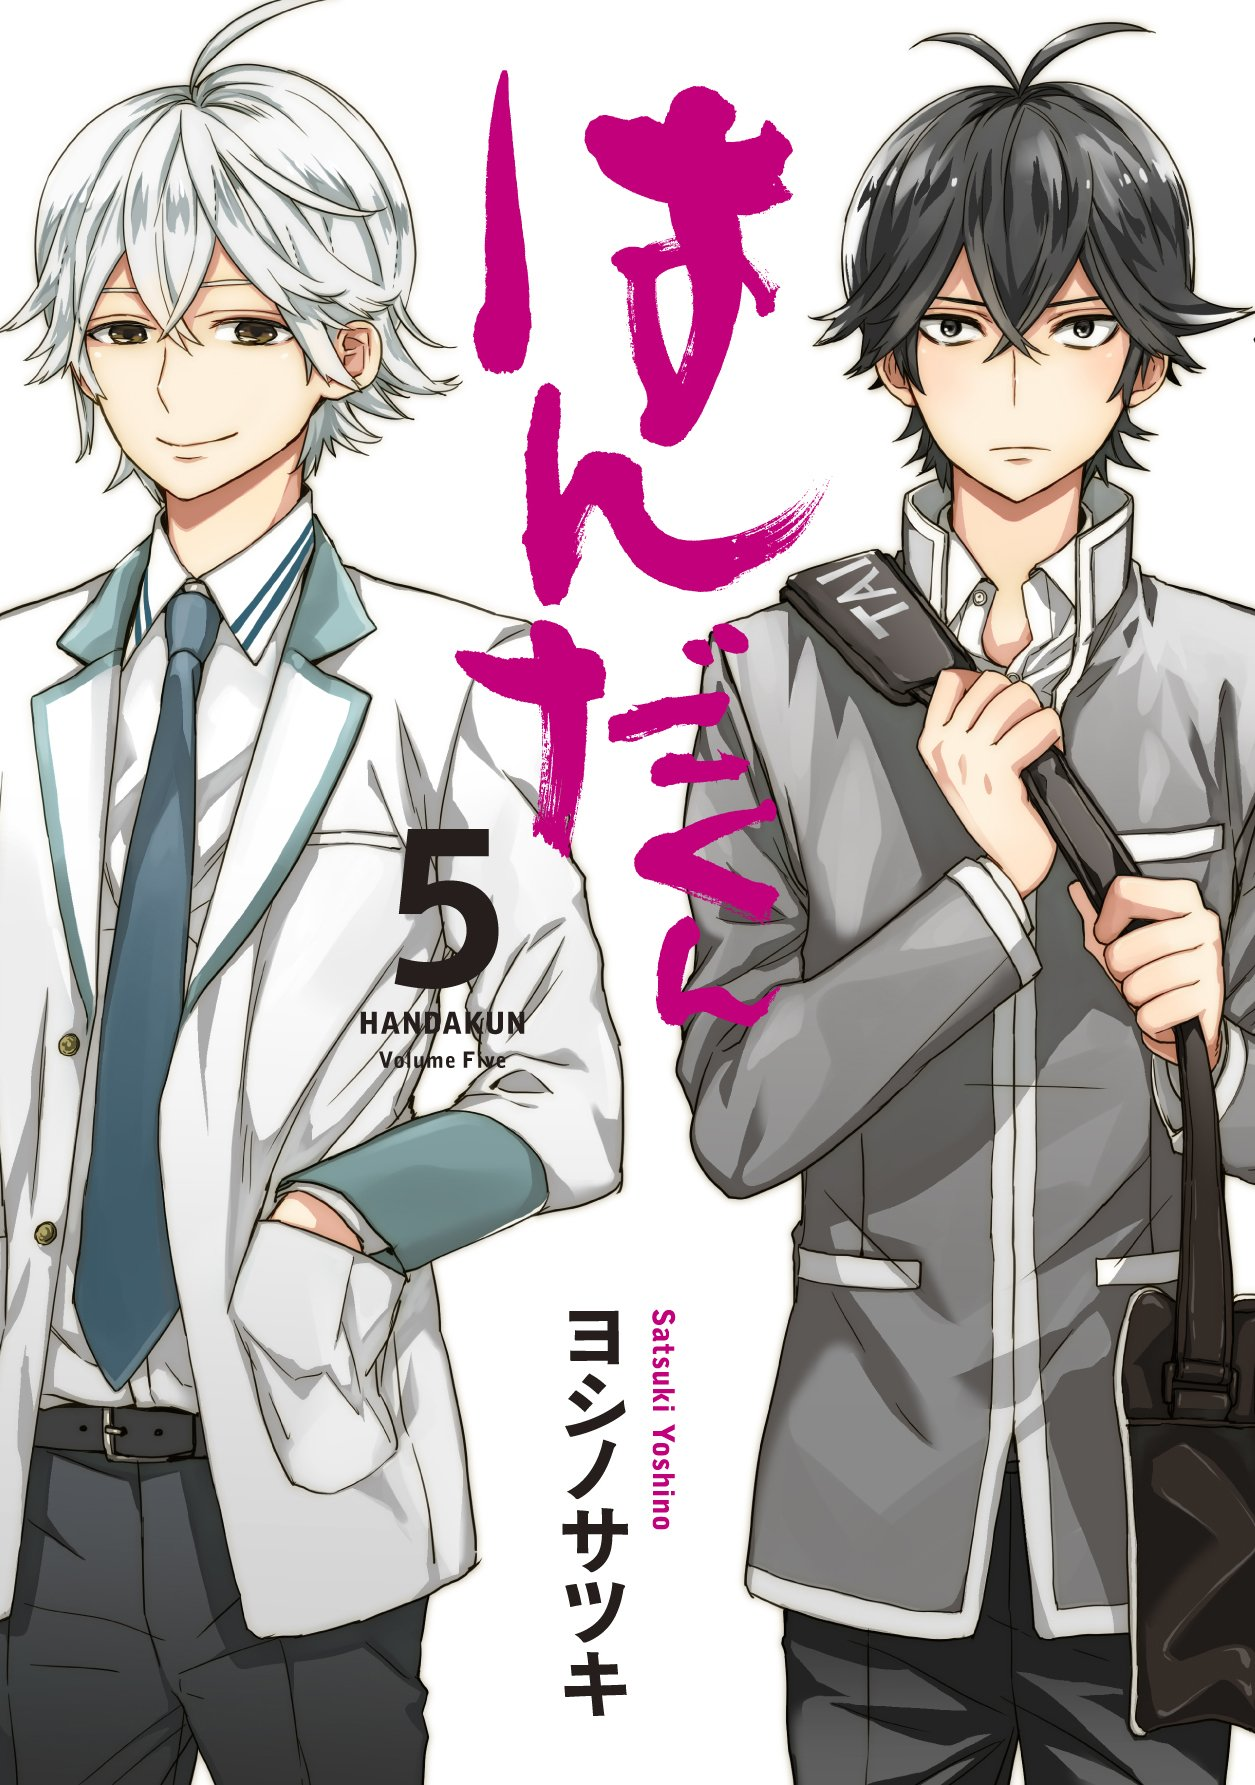 HD Quality Wallpaper | Collection: Anime, 1255x1785 Handa-Kun